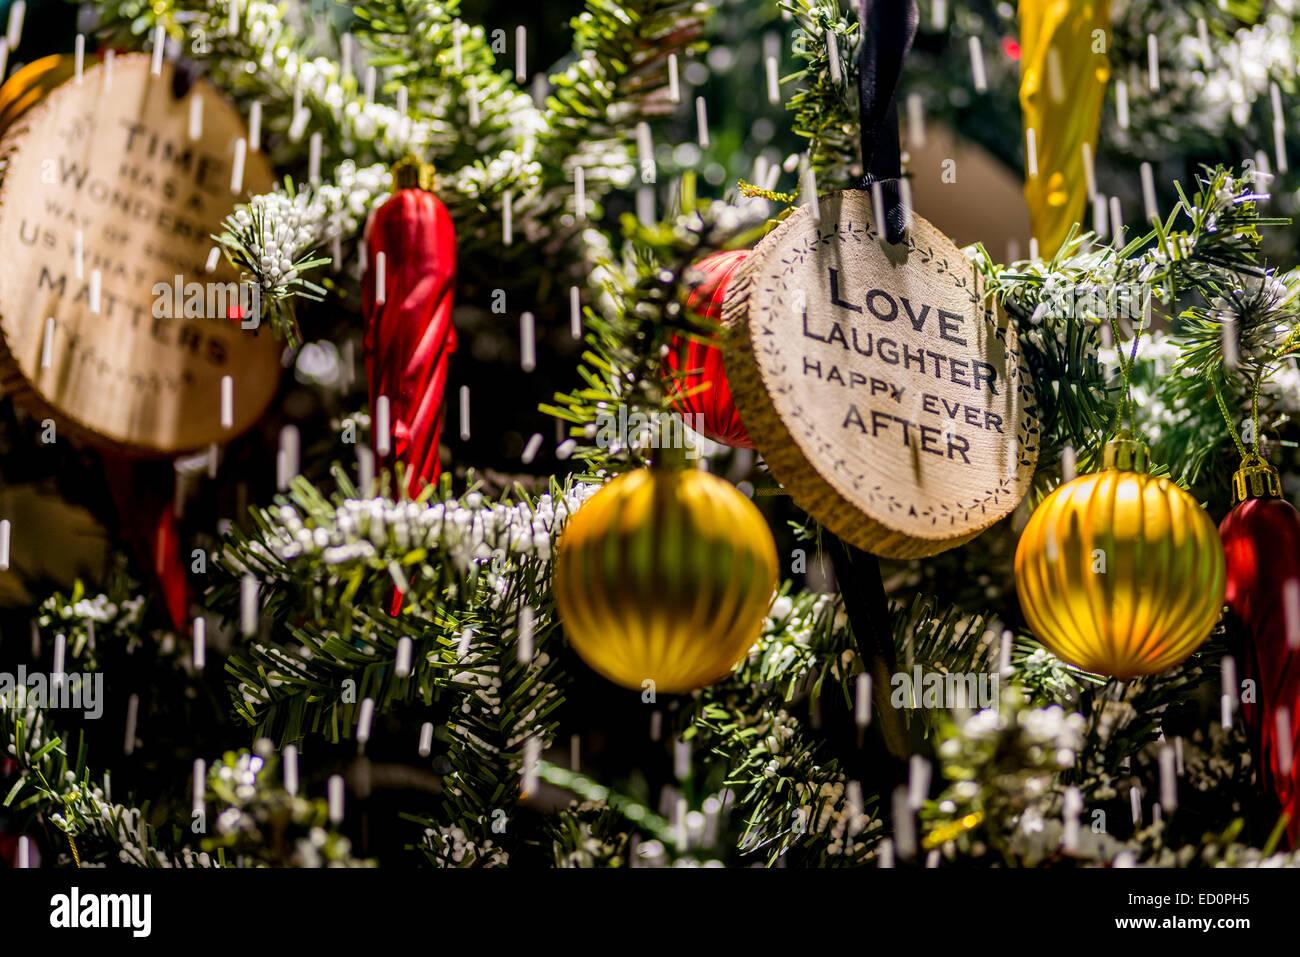 Christmas greetings on a christmas tree wish you all merry christmas greetings on a christmas tree wish you all merry christmas and happy new year m4hsunfo